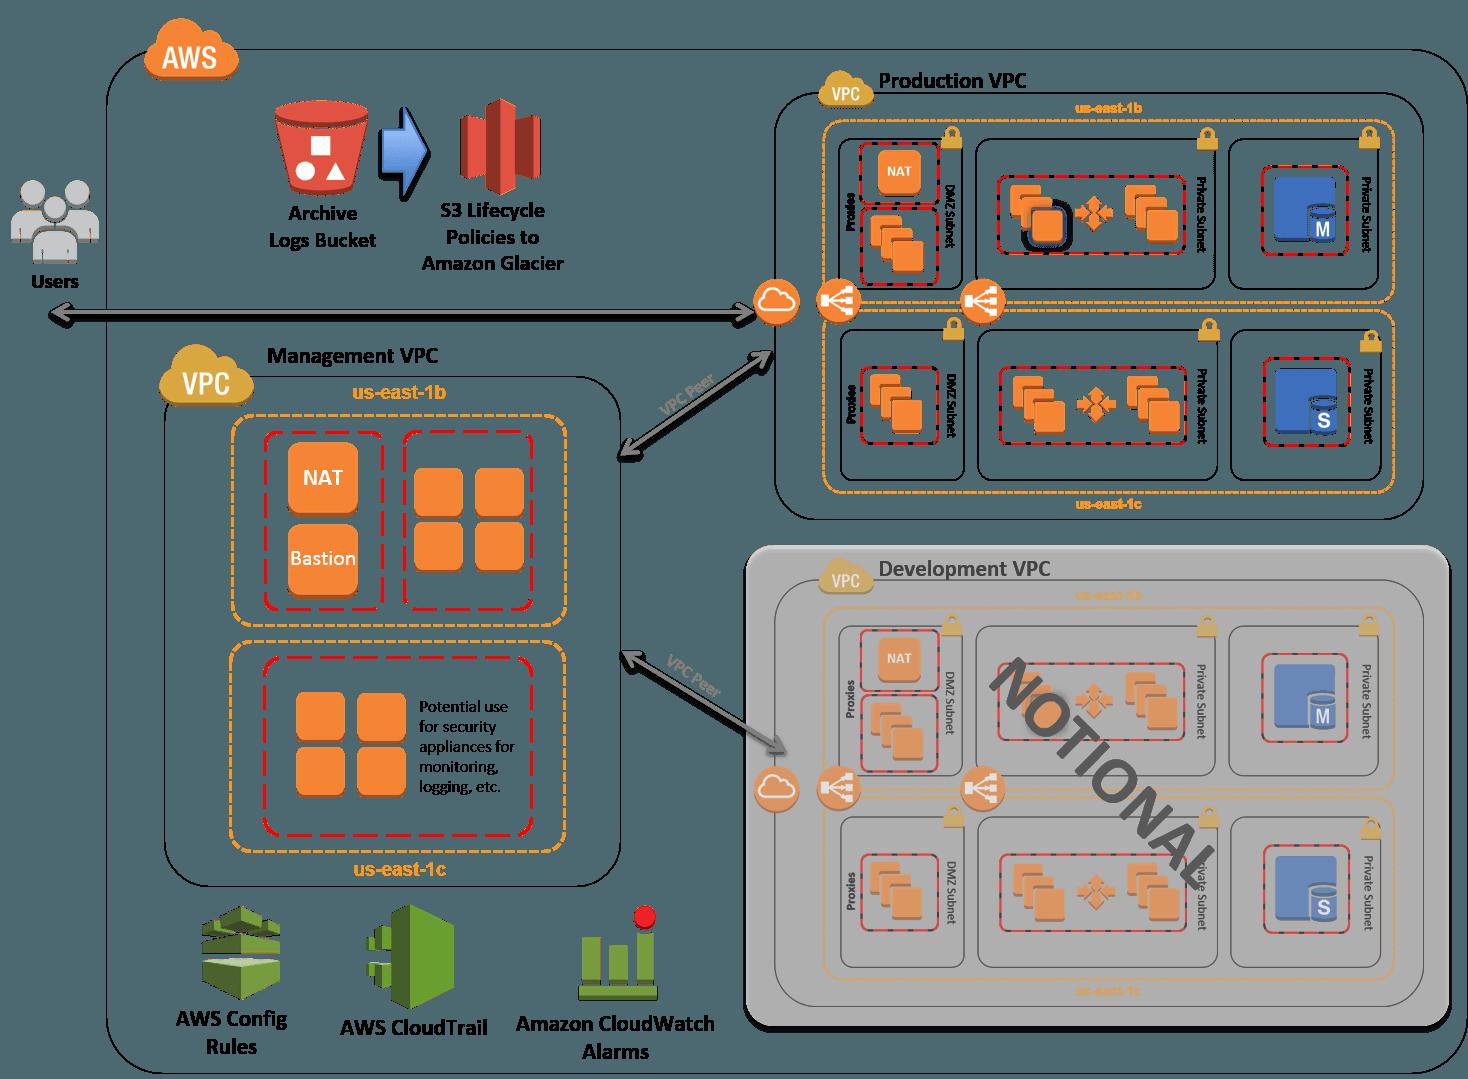 800-53 Controls - National Vulnerability Database